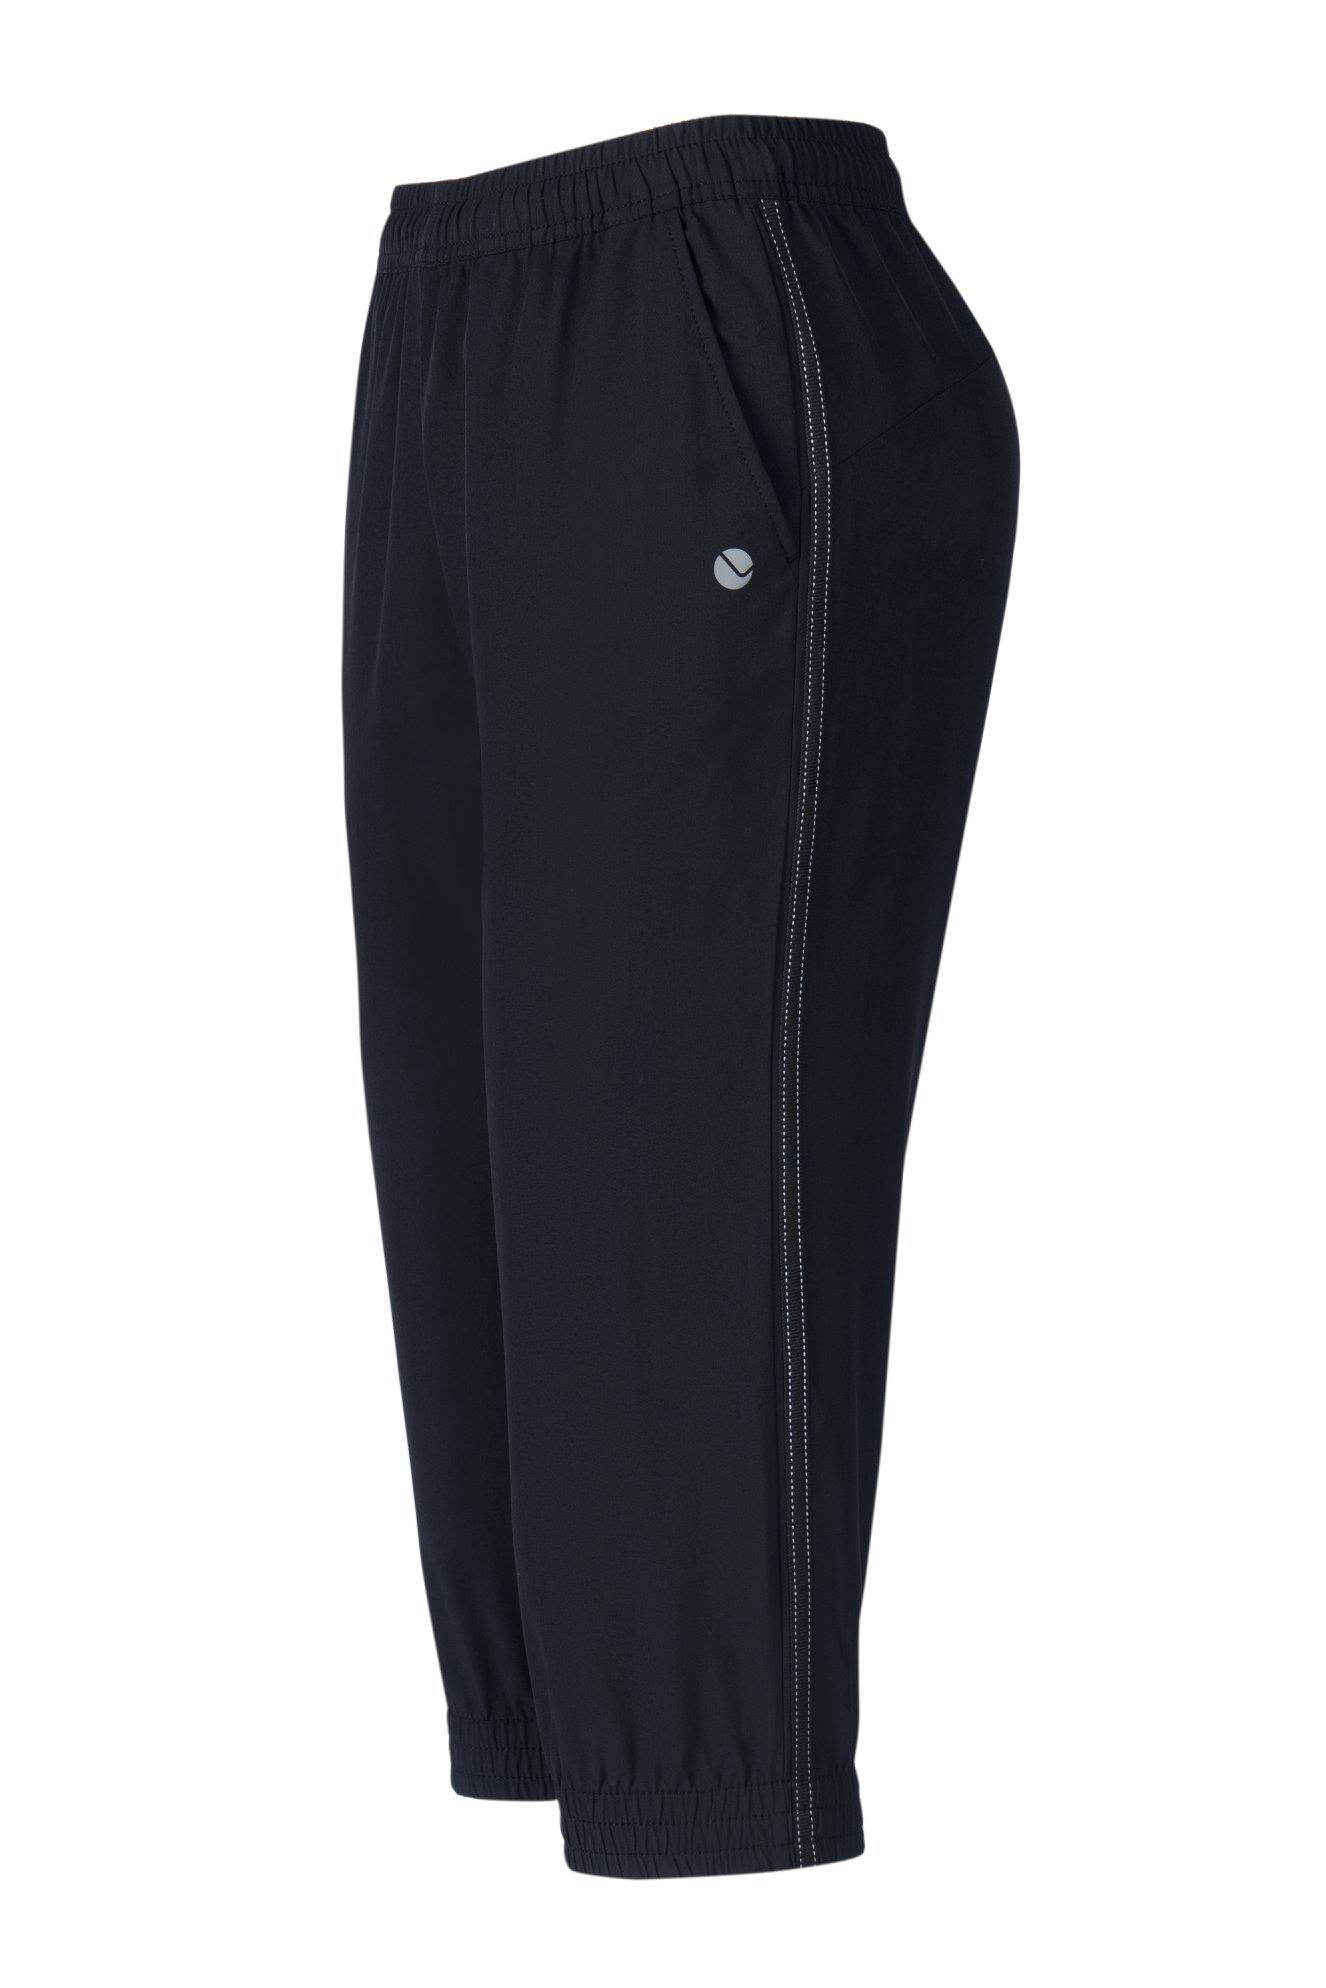 Quần Capri Nữ LV21210102